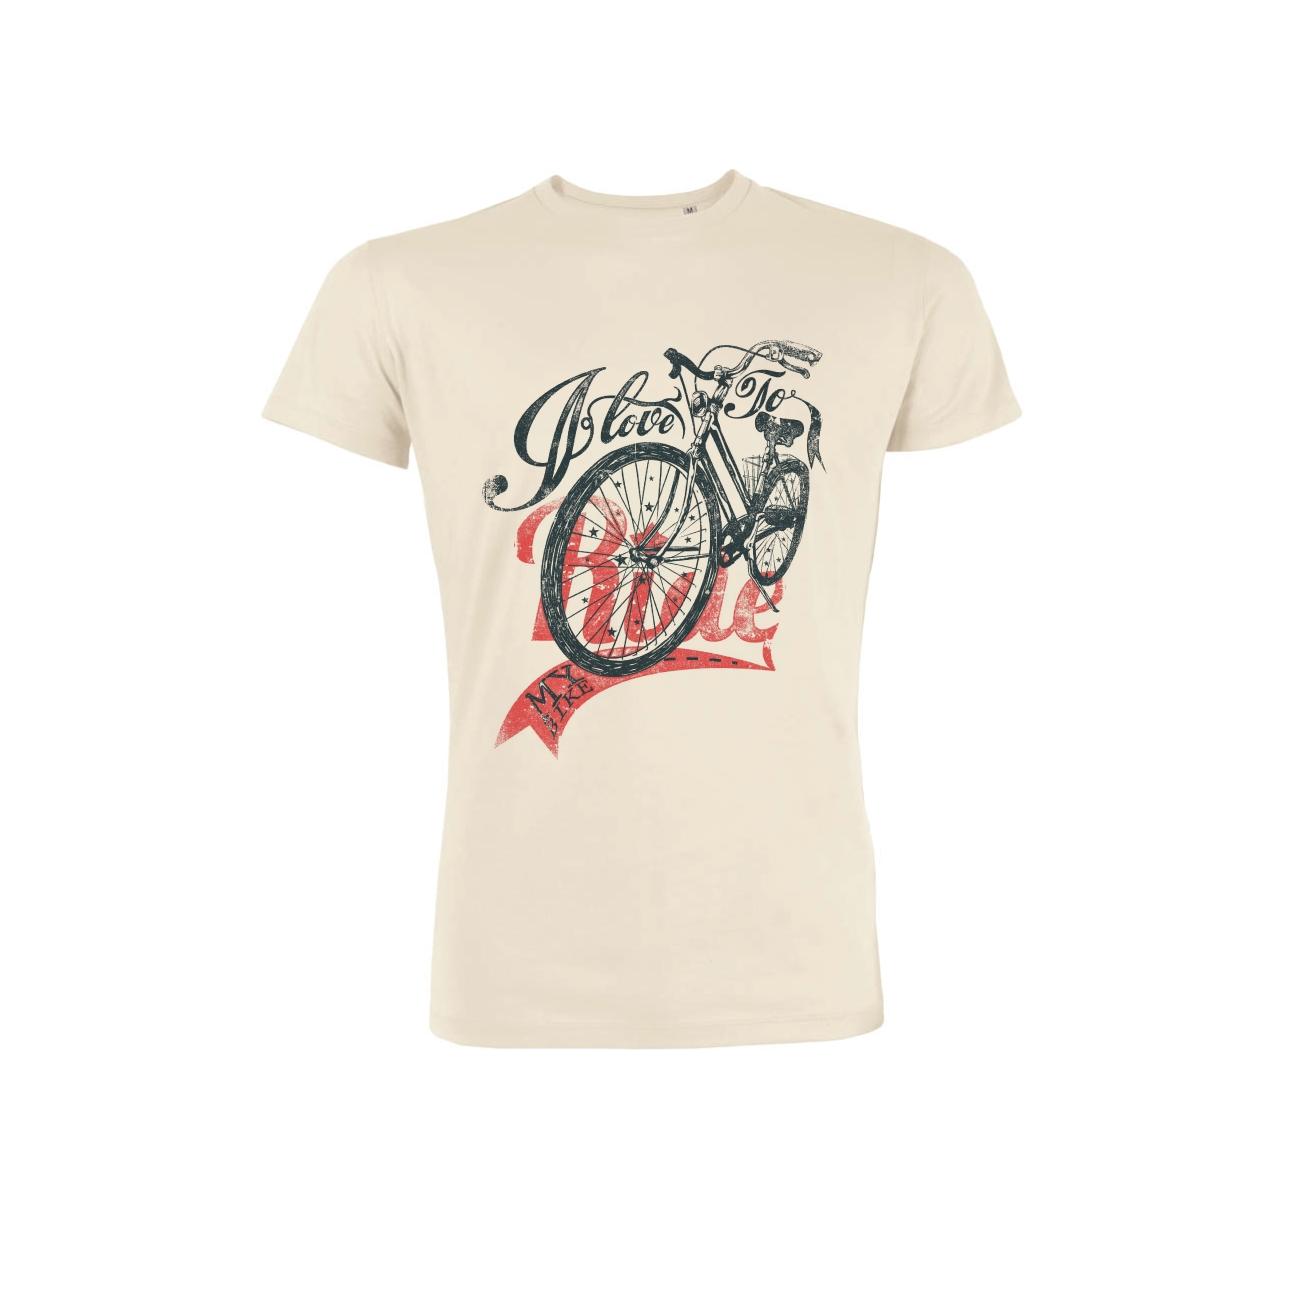 tee shirt coton bio rider blanc vintage leads 88. Black Bedroom Furniture Sets. Home Design Ideas